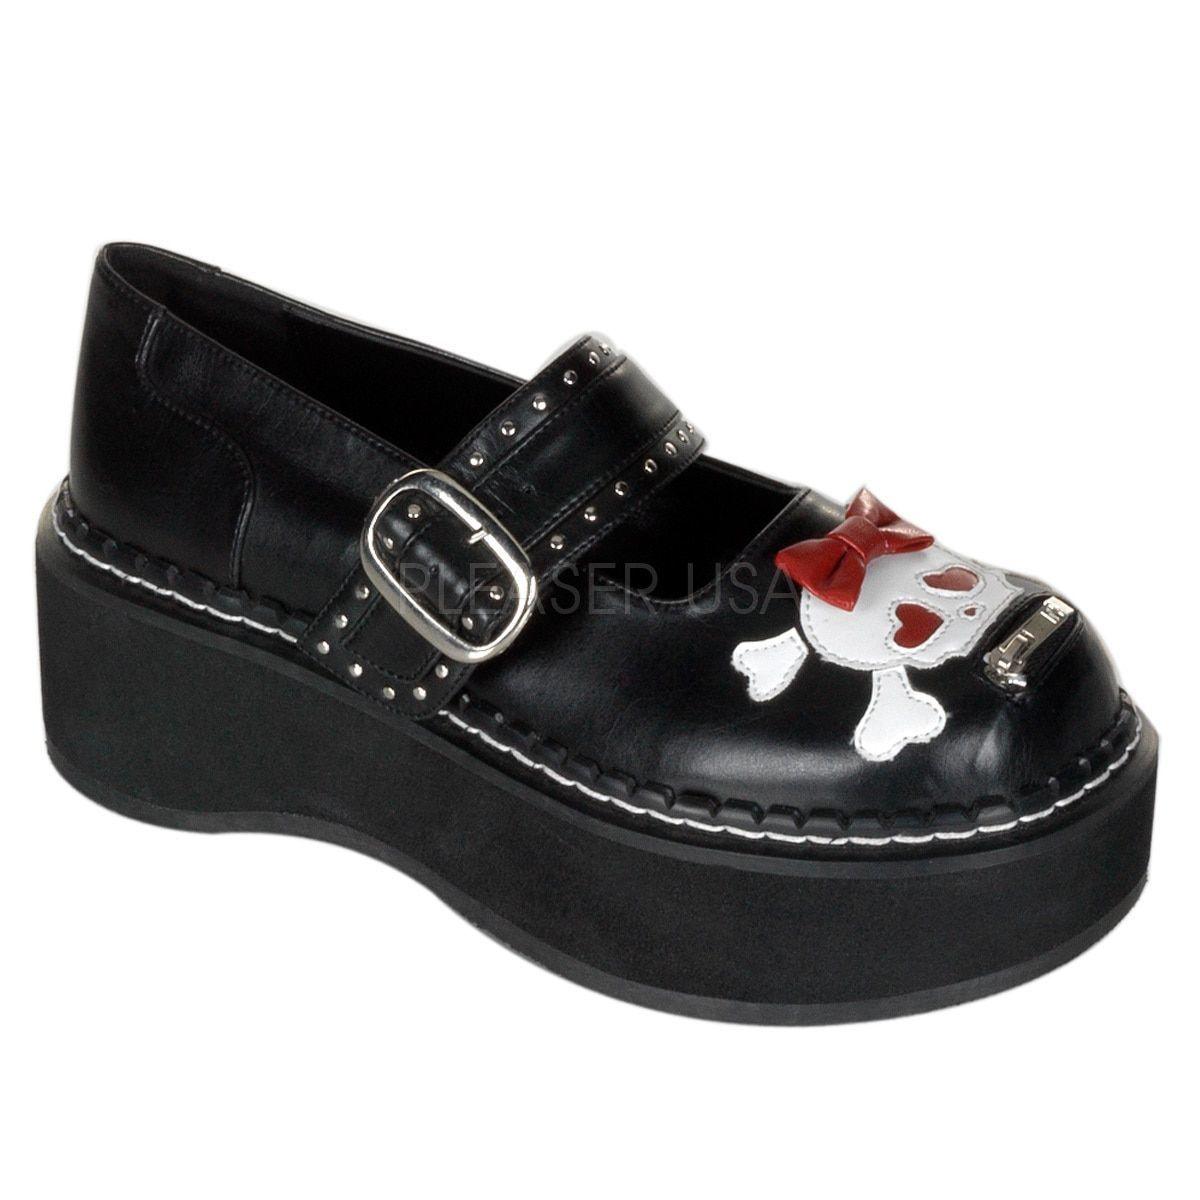 99c0bd0c274d5c Demonia Women s  Emily-221  Skull Mary Jane Platform Shoes ...